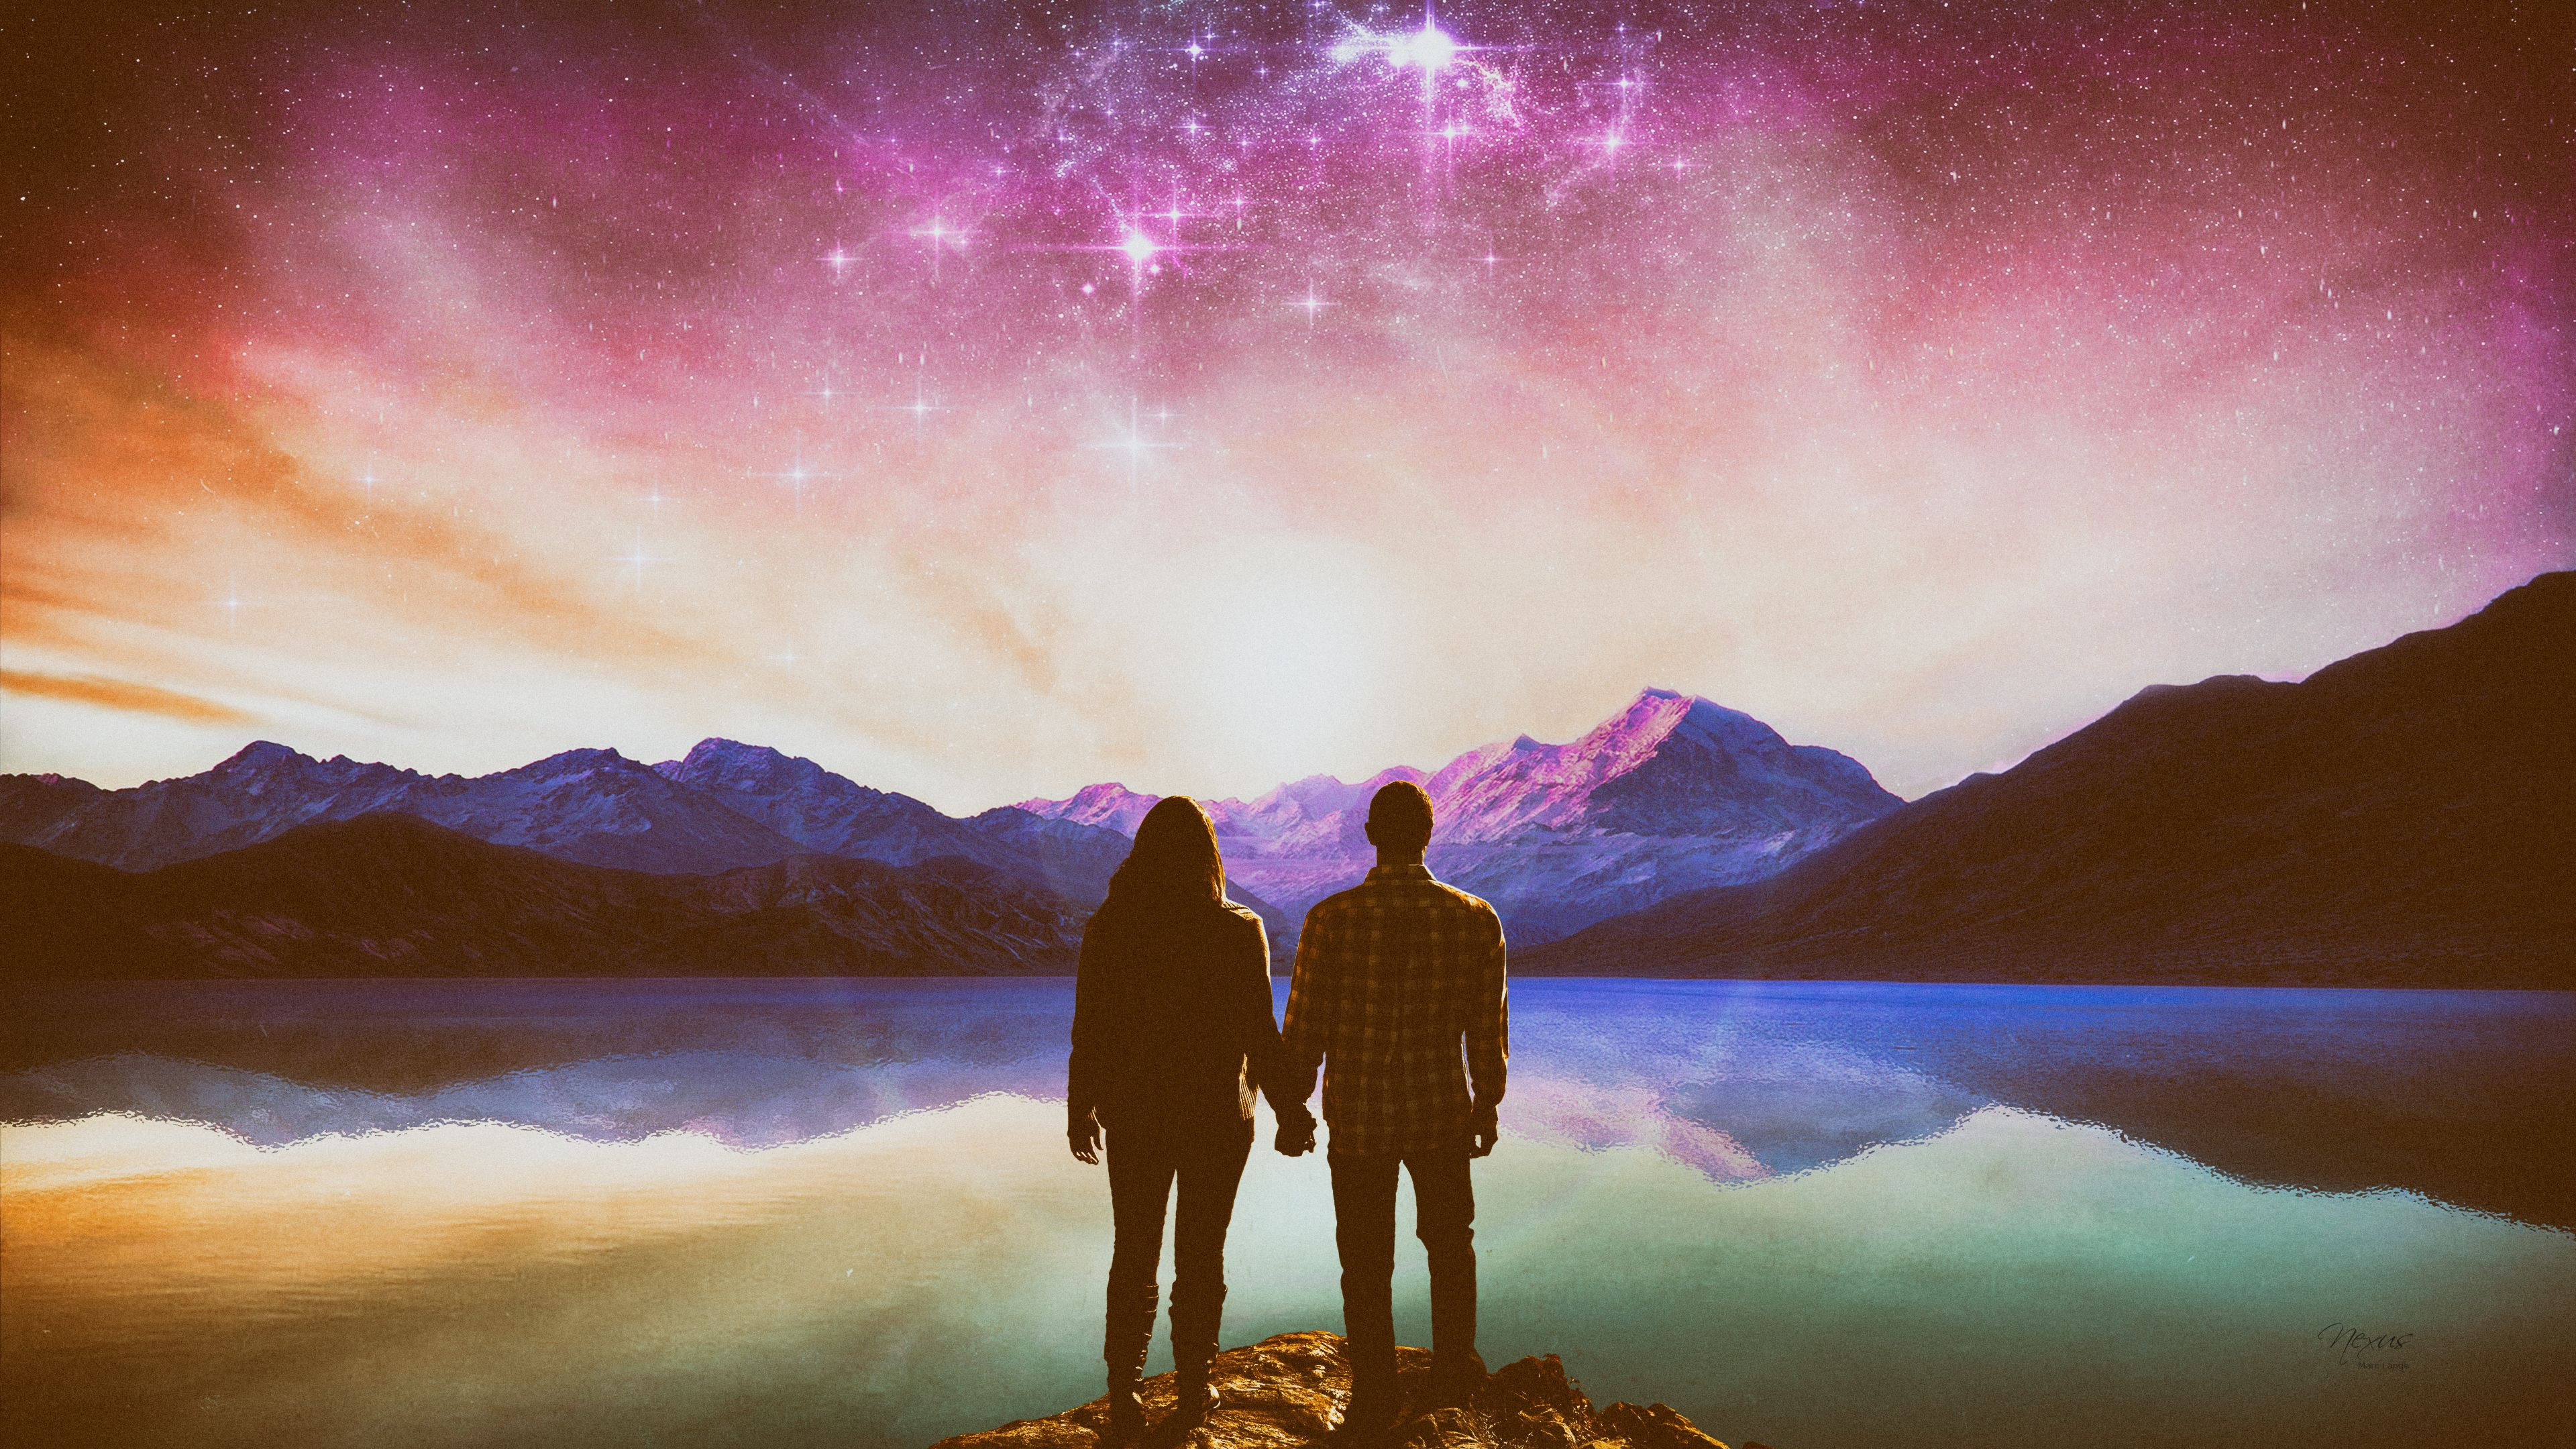 Fantasy Landscape 4k Ultra HD Mountain Couple Love Romance